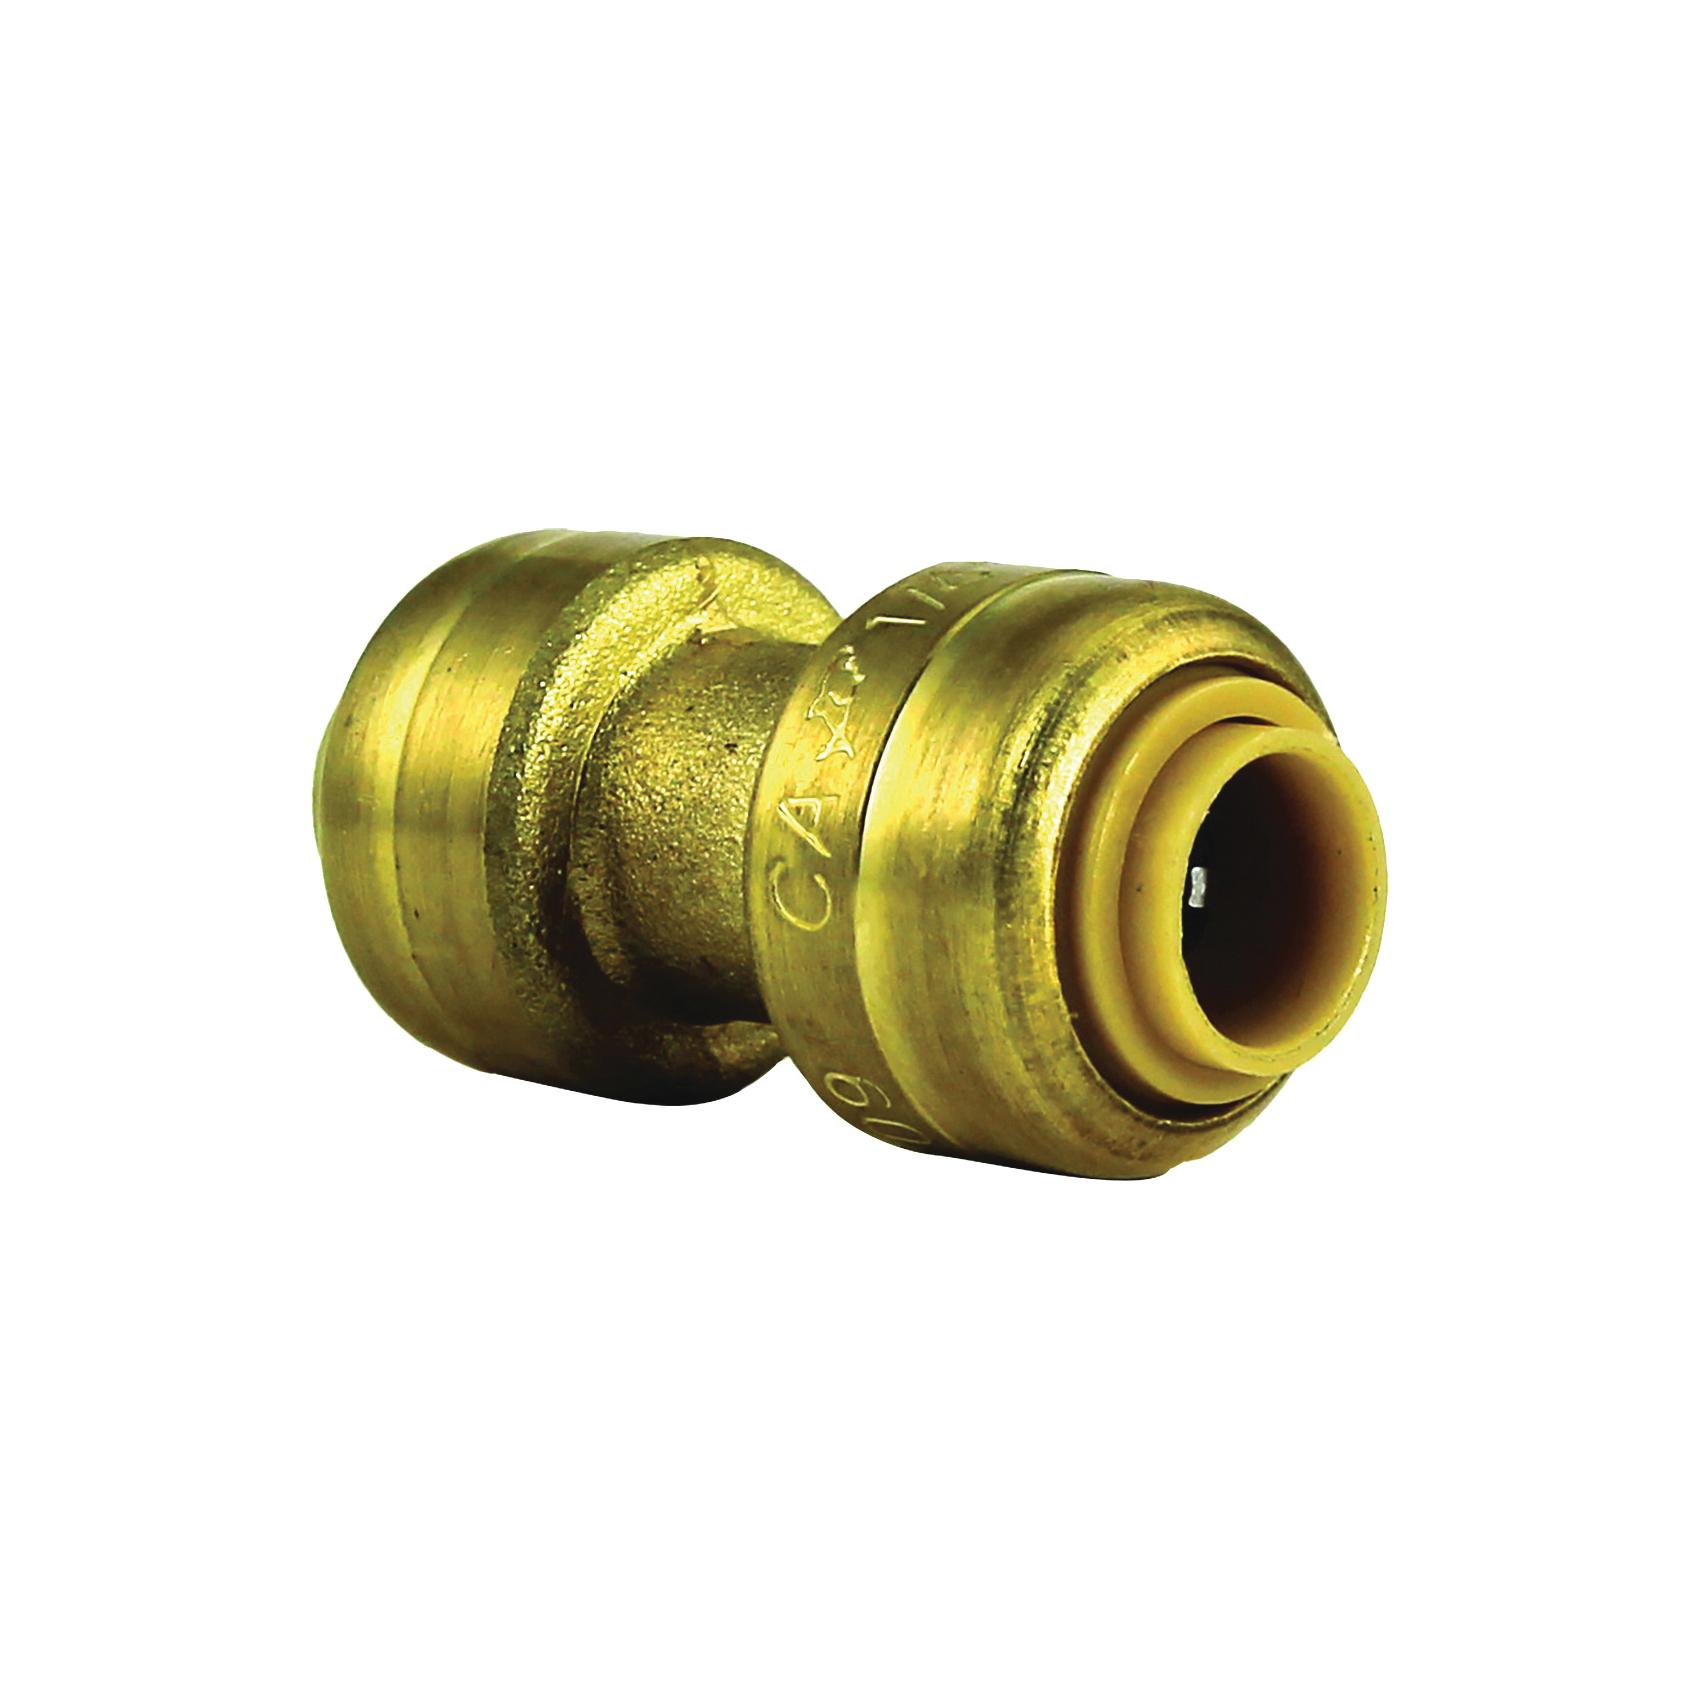 Picture of SharkBite U004LFA Tube Coupler, 1/4 in, Brass, 200 psi Pressure